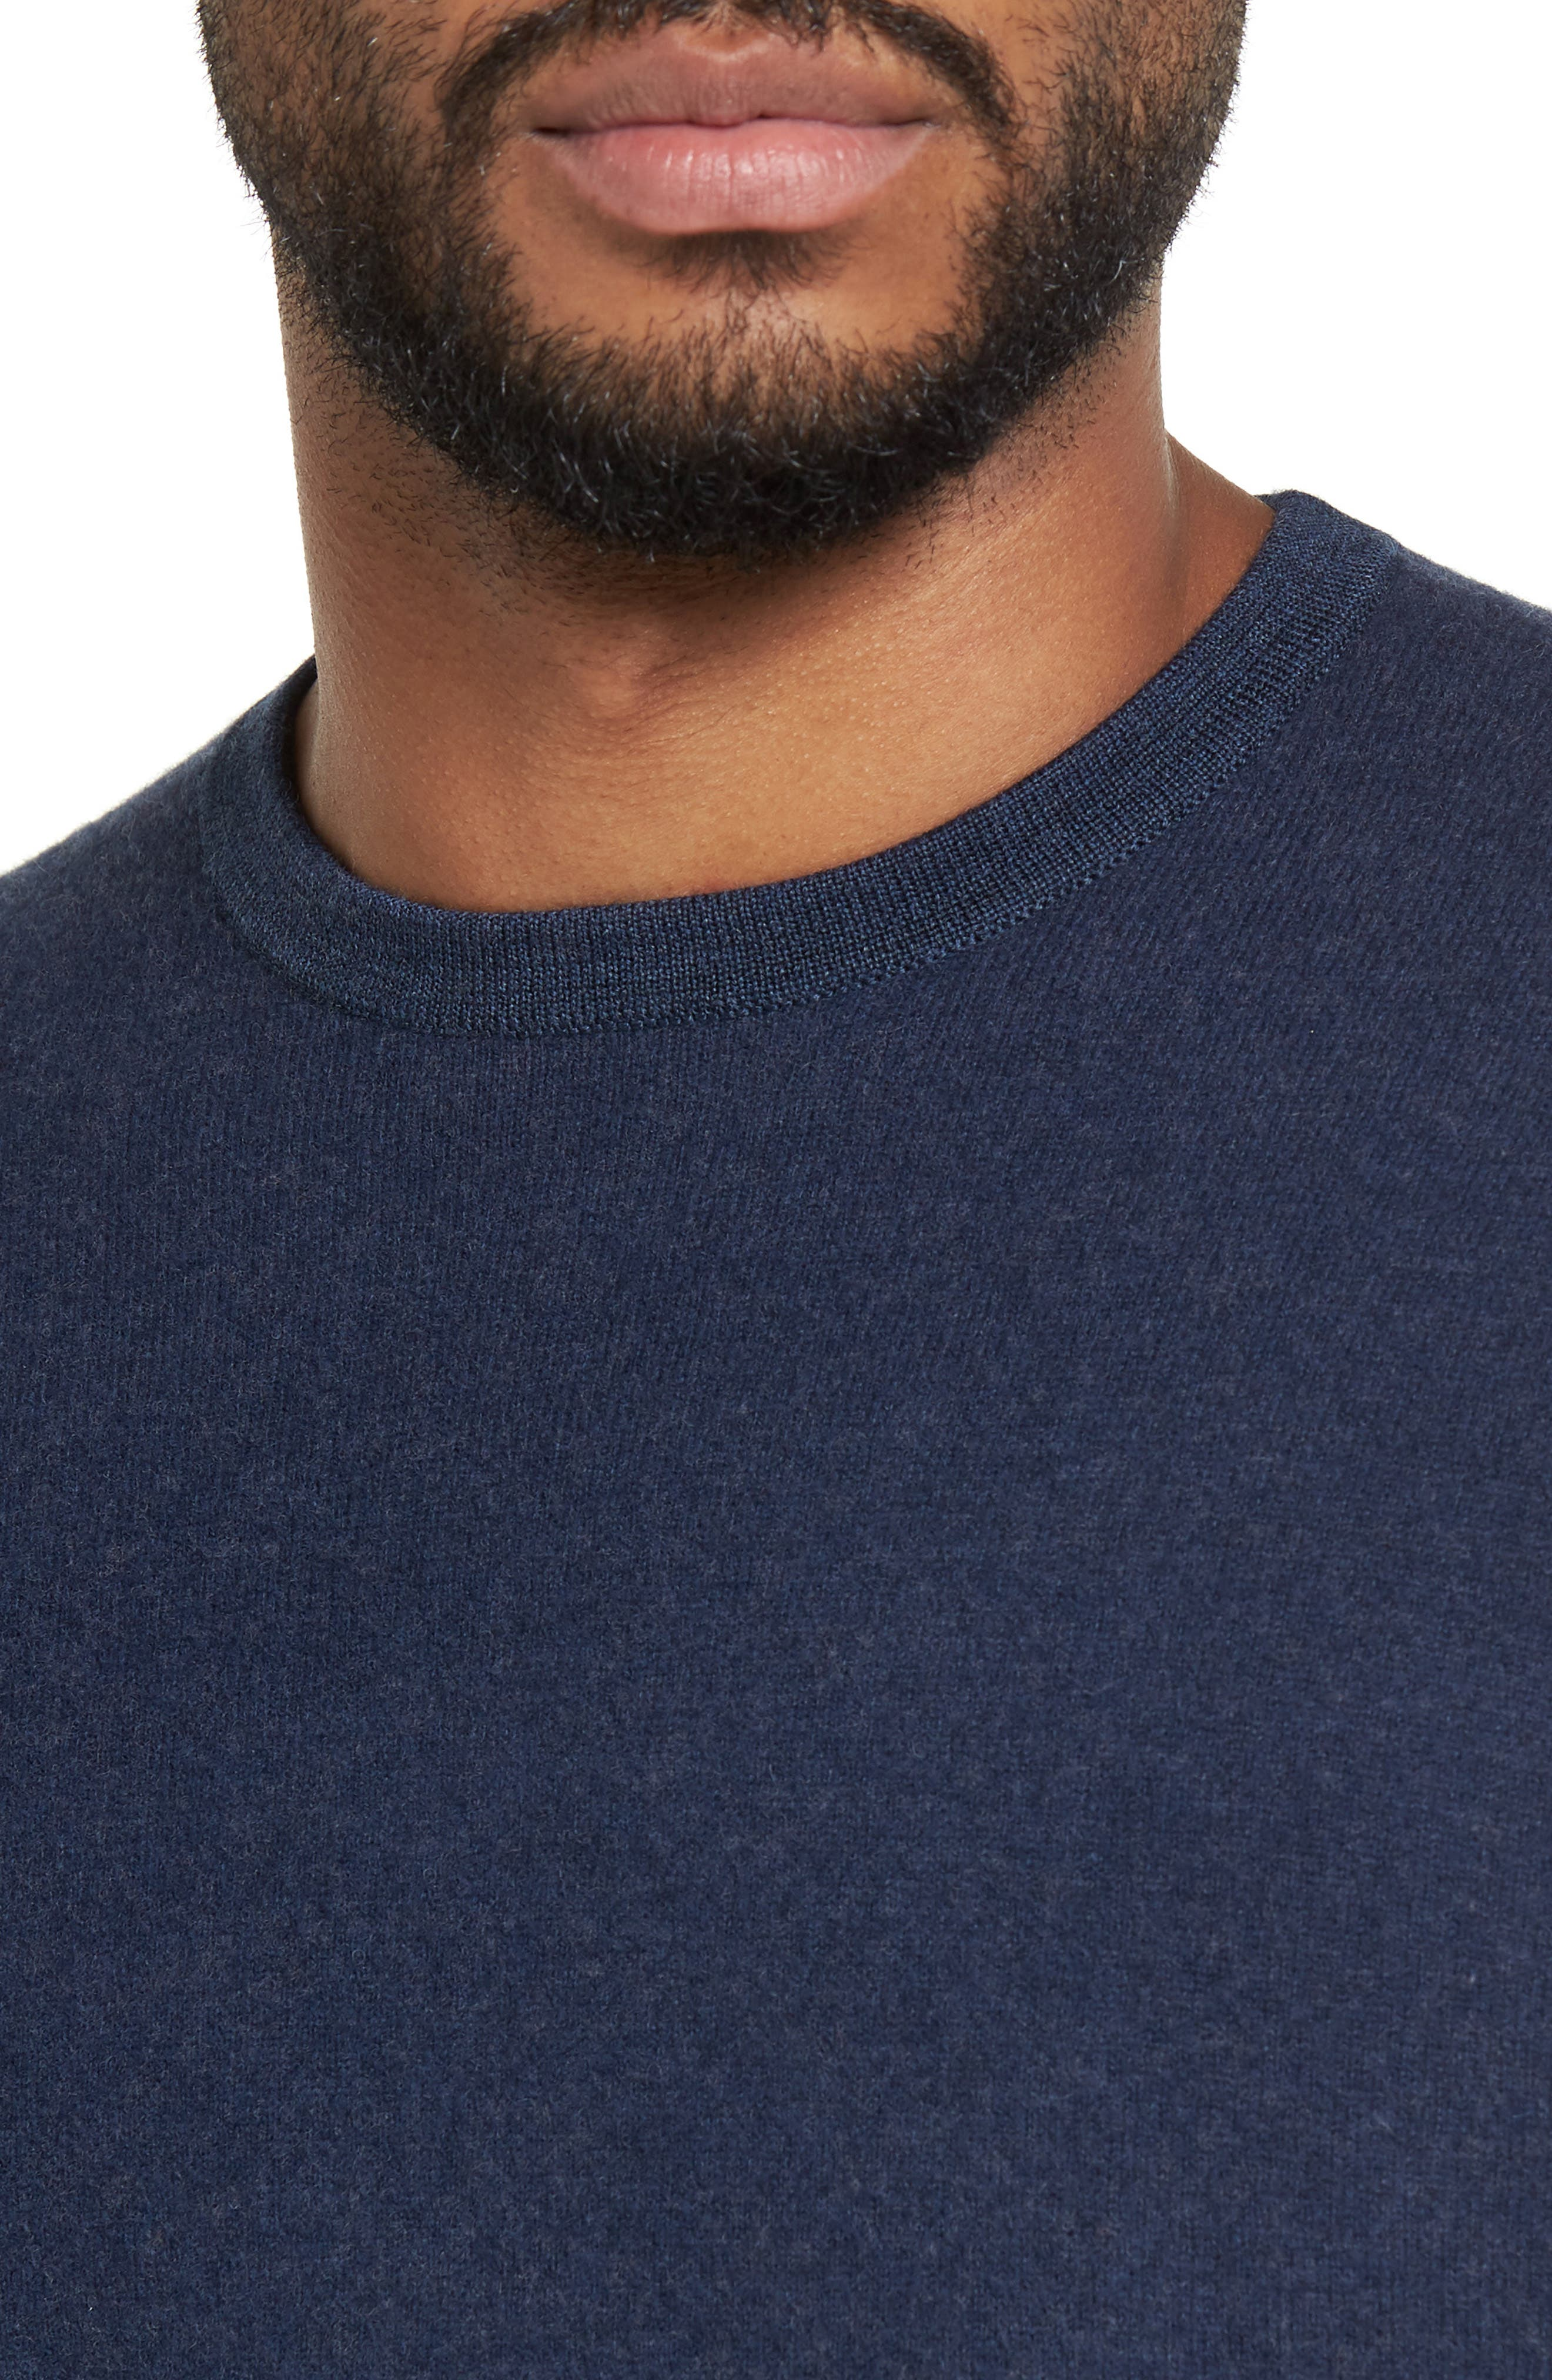 Merino Wool Blend Sweater,                             Alternate thumbnail 4, color,                             Navy Iris